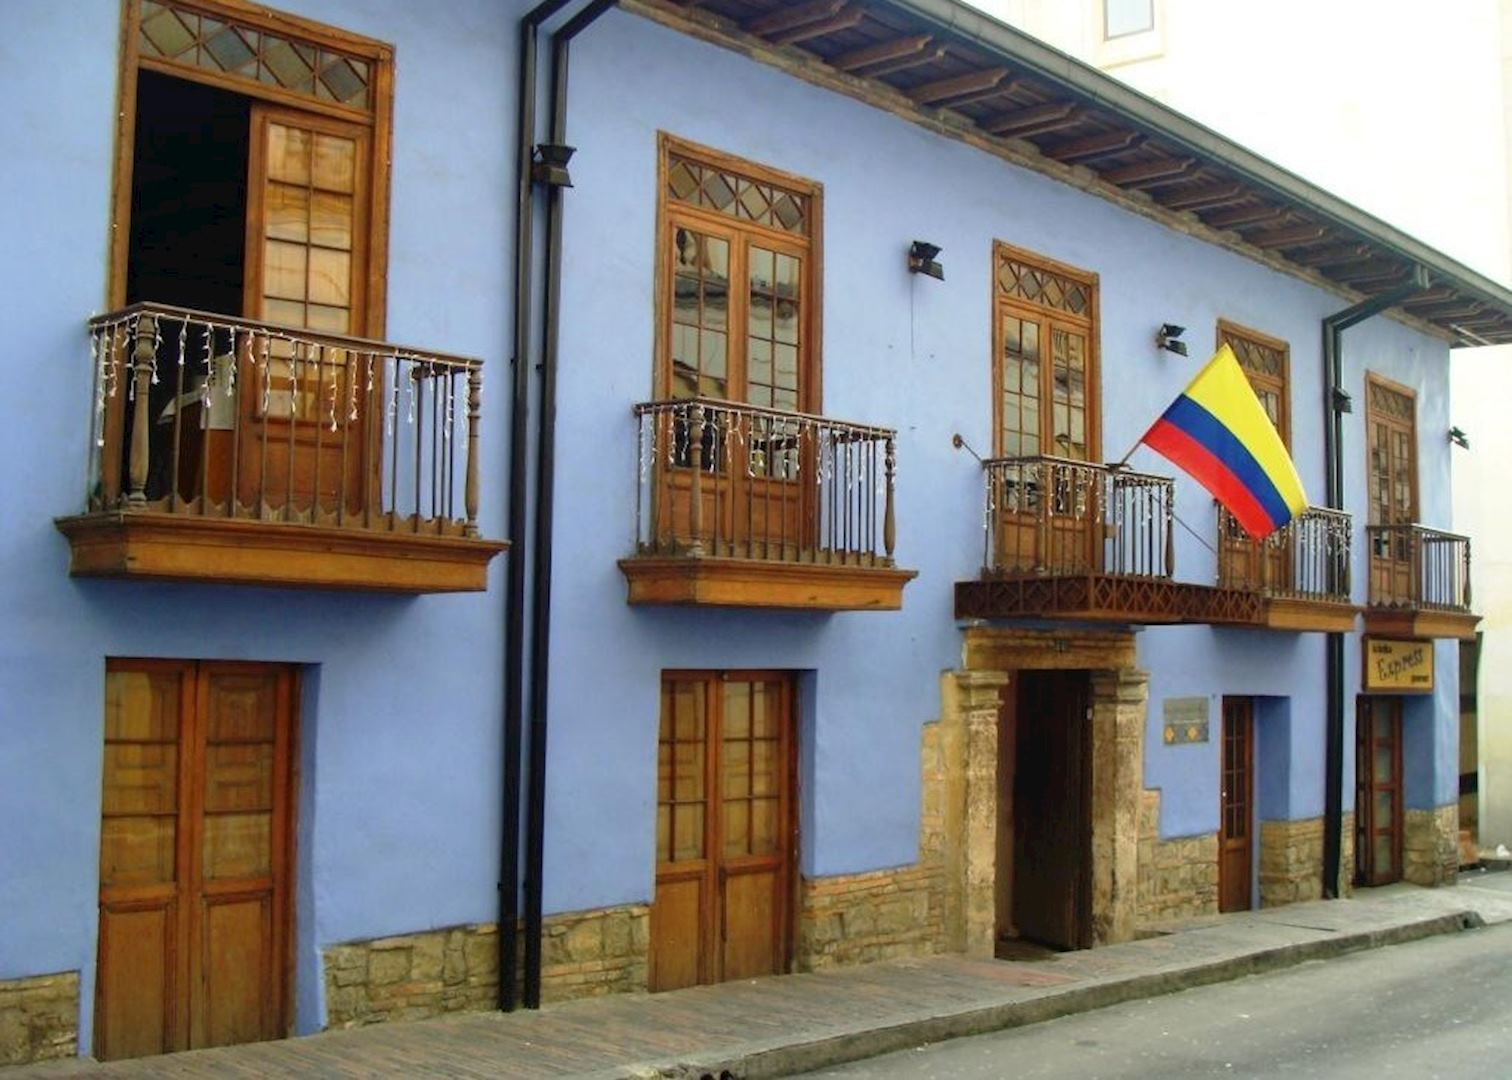 Casa de la botica hotels in bogota audley travel for Casa colombia